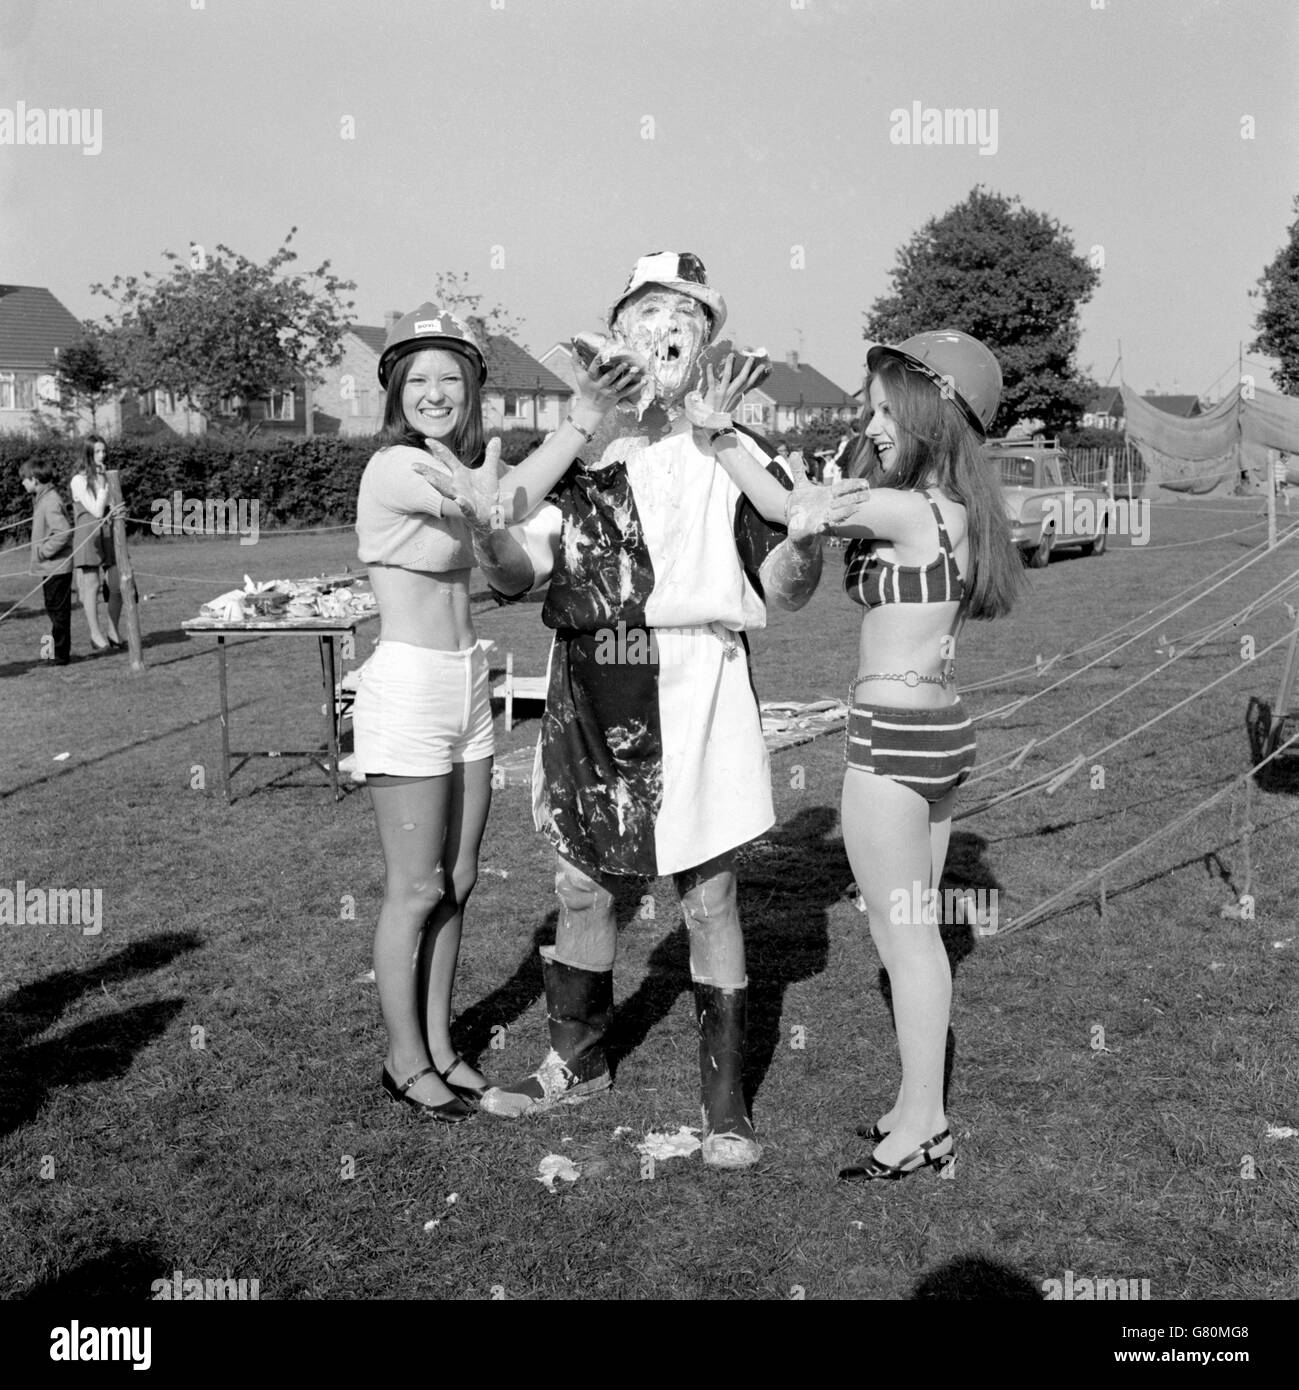 Entertainment - Third World Custard Pie Championships - Coxheath Fete, Maidstone - Stock Image